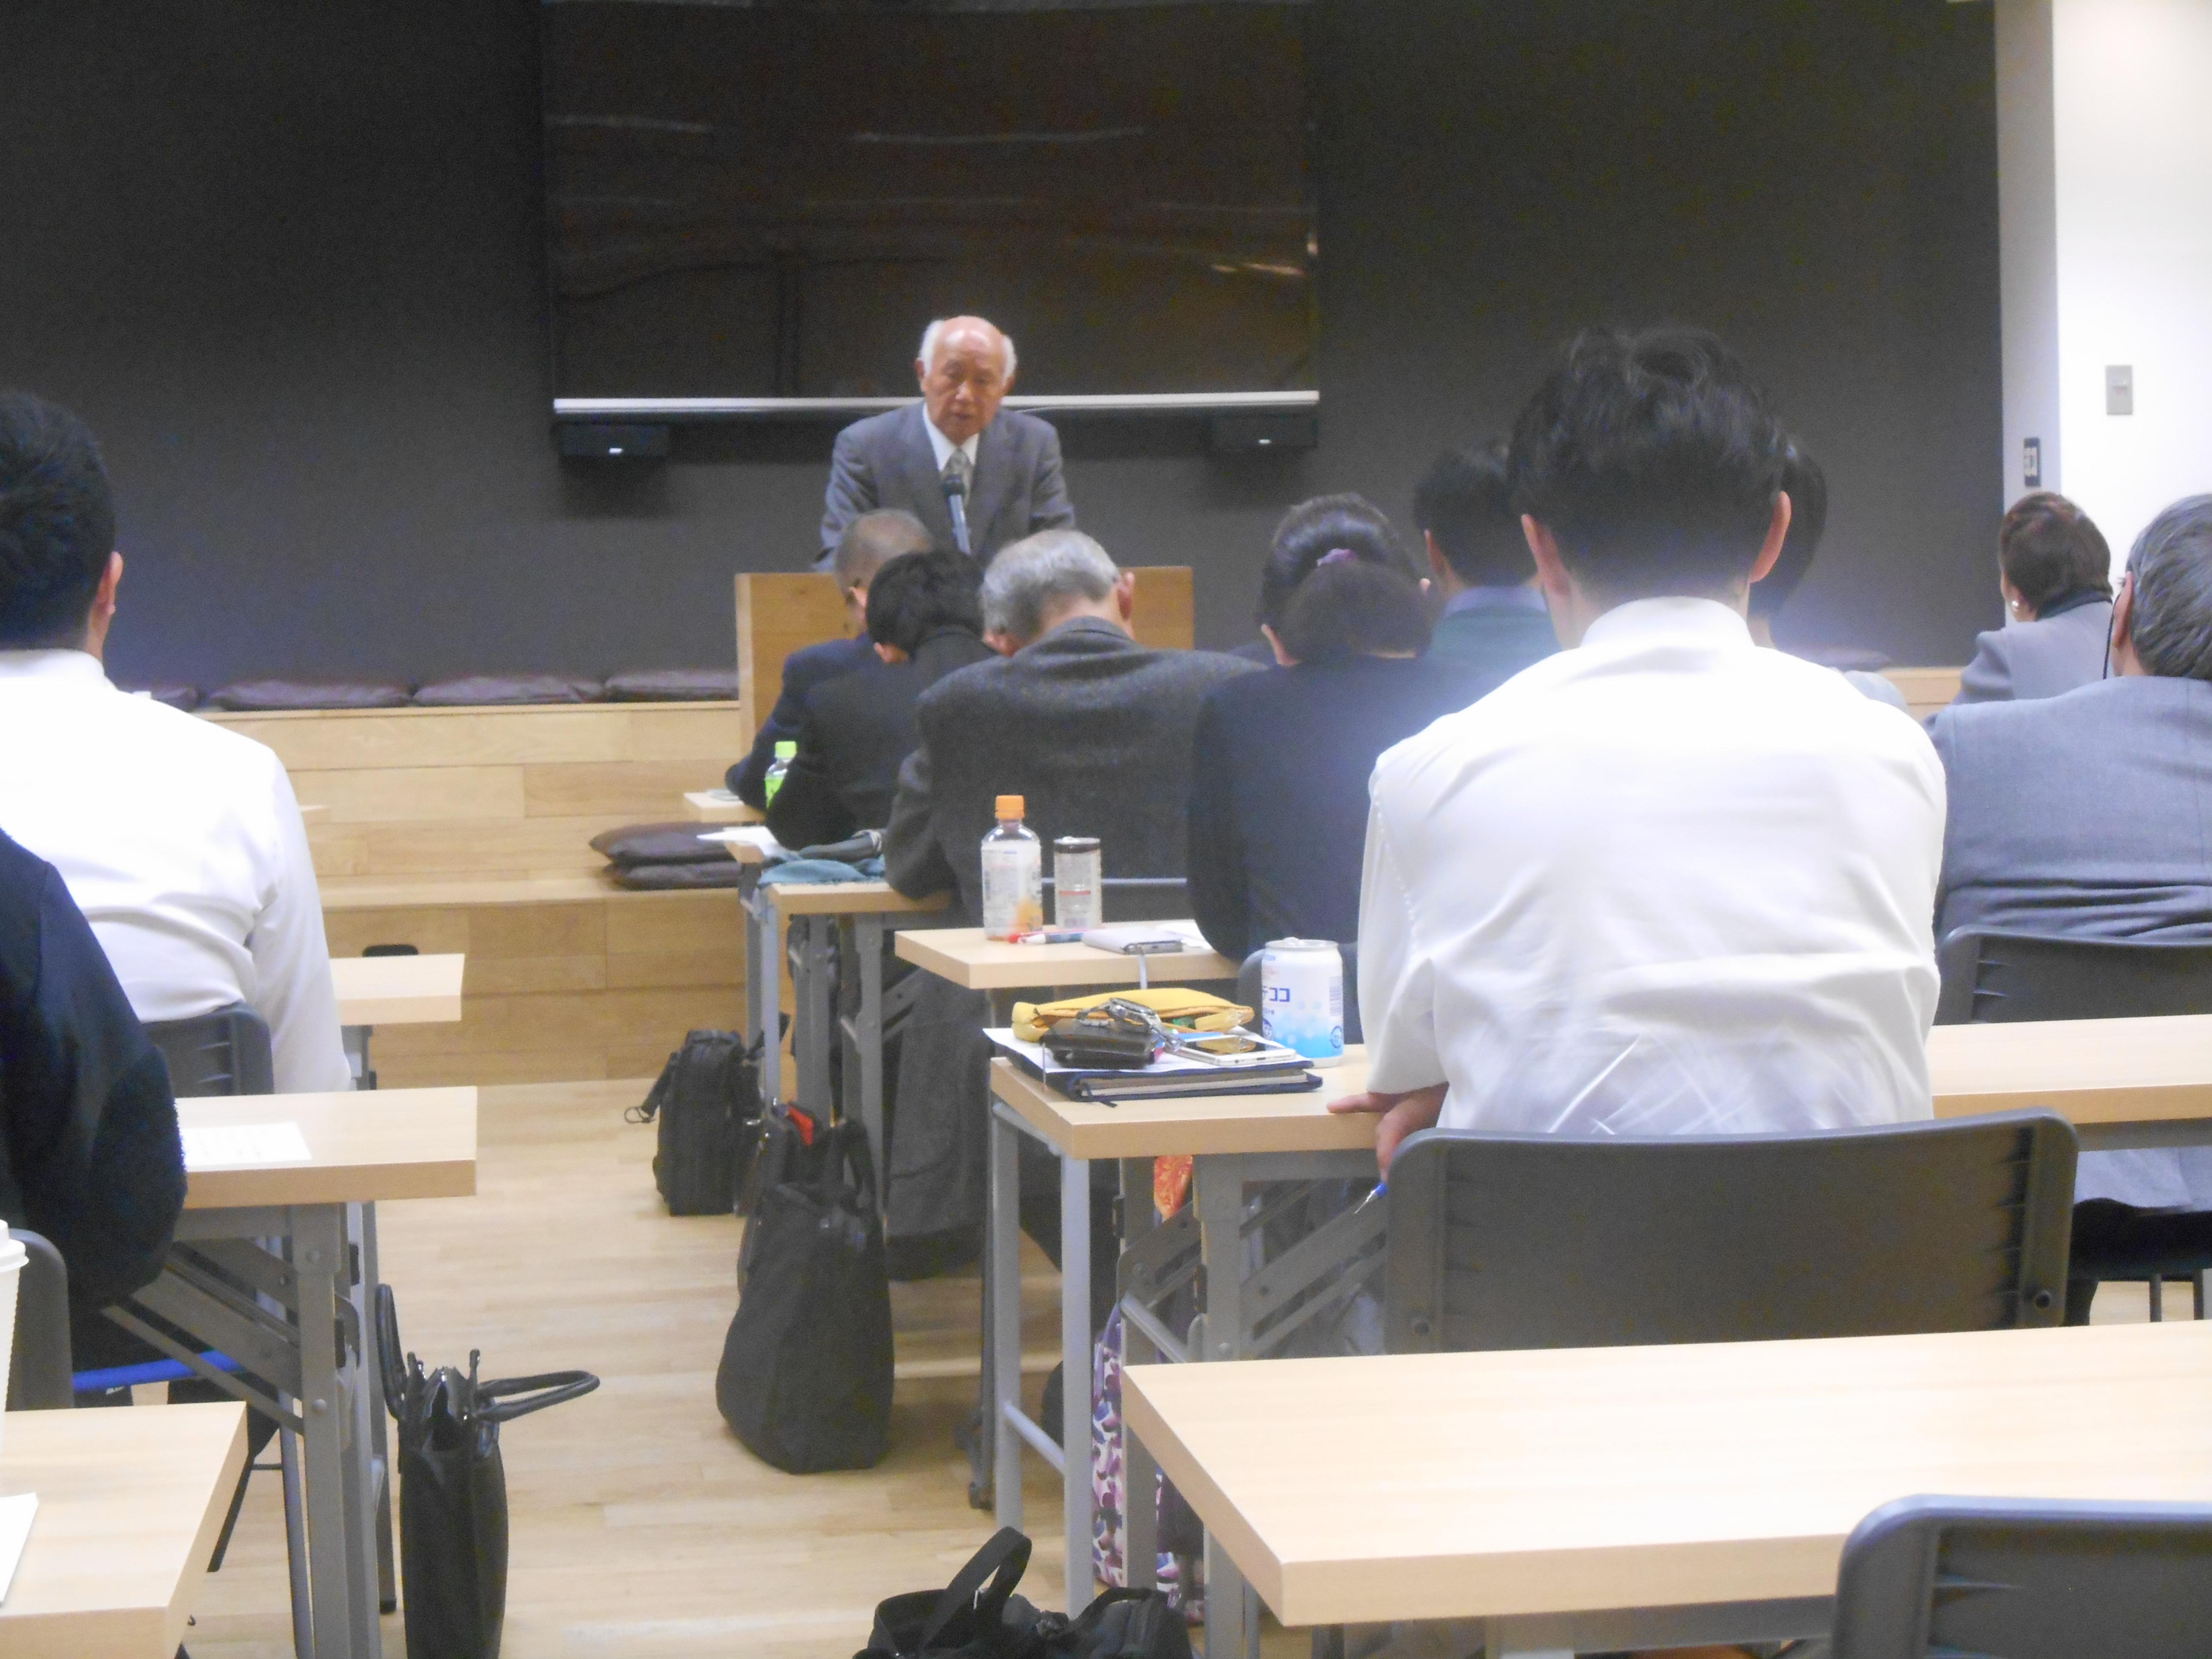 DSCN2313 - 4月1日東京思風塾の開催になります。